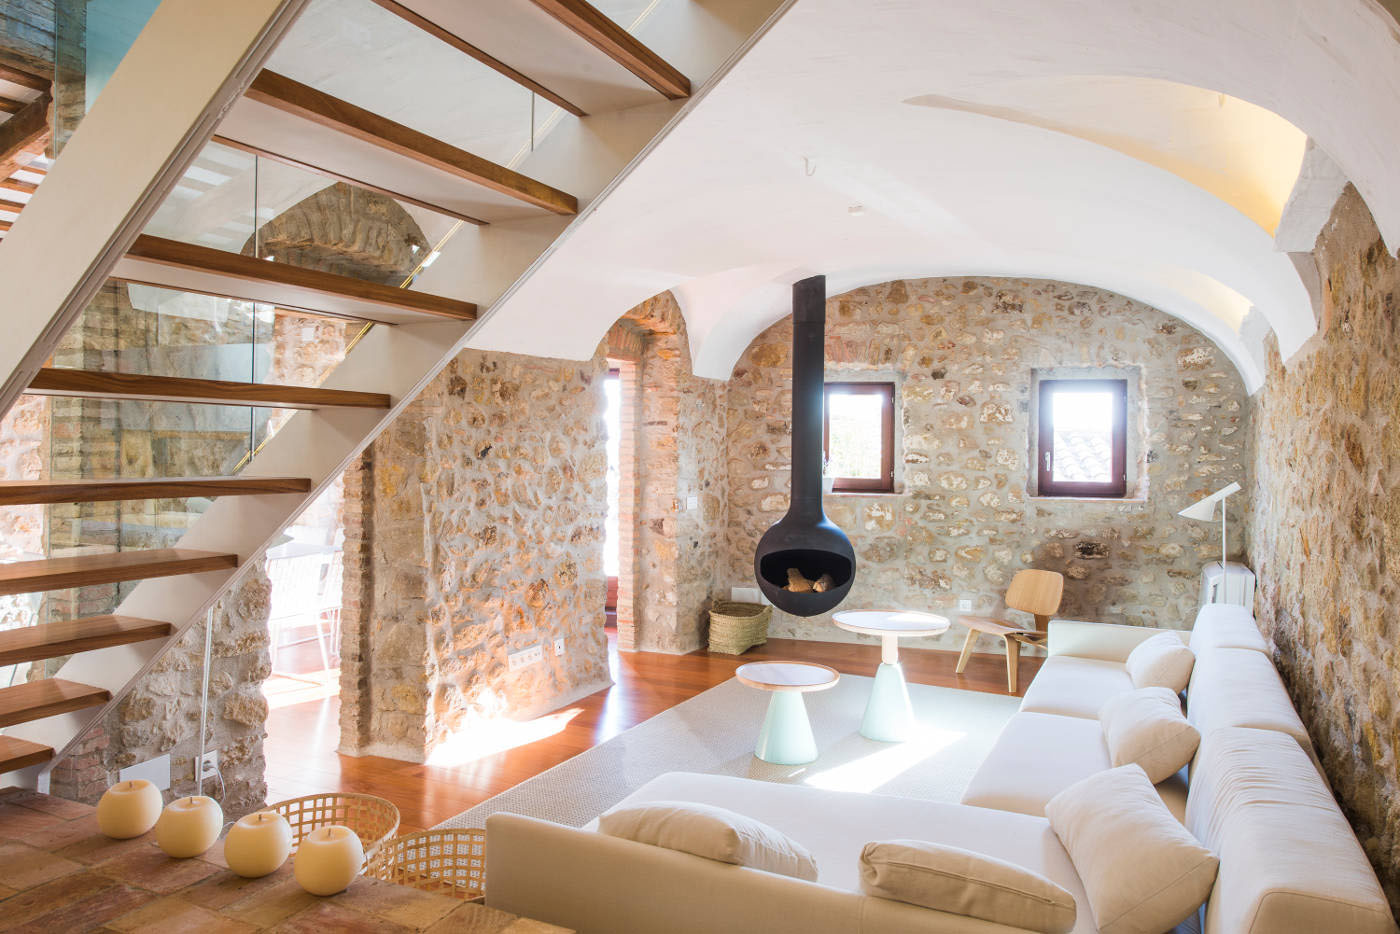 A 19th Century Stone House On The Costa Brava Transformed